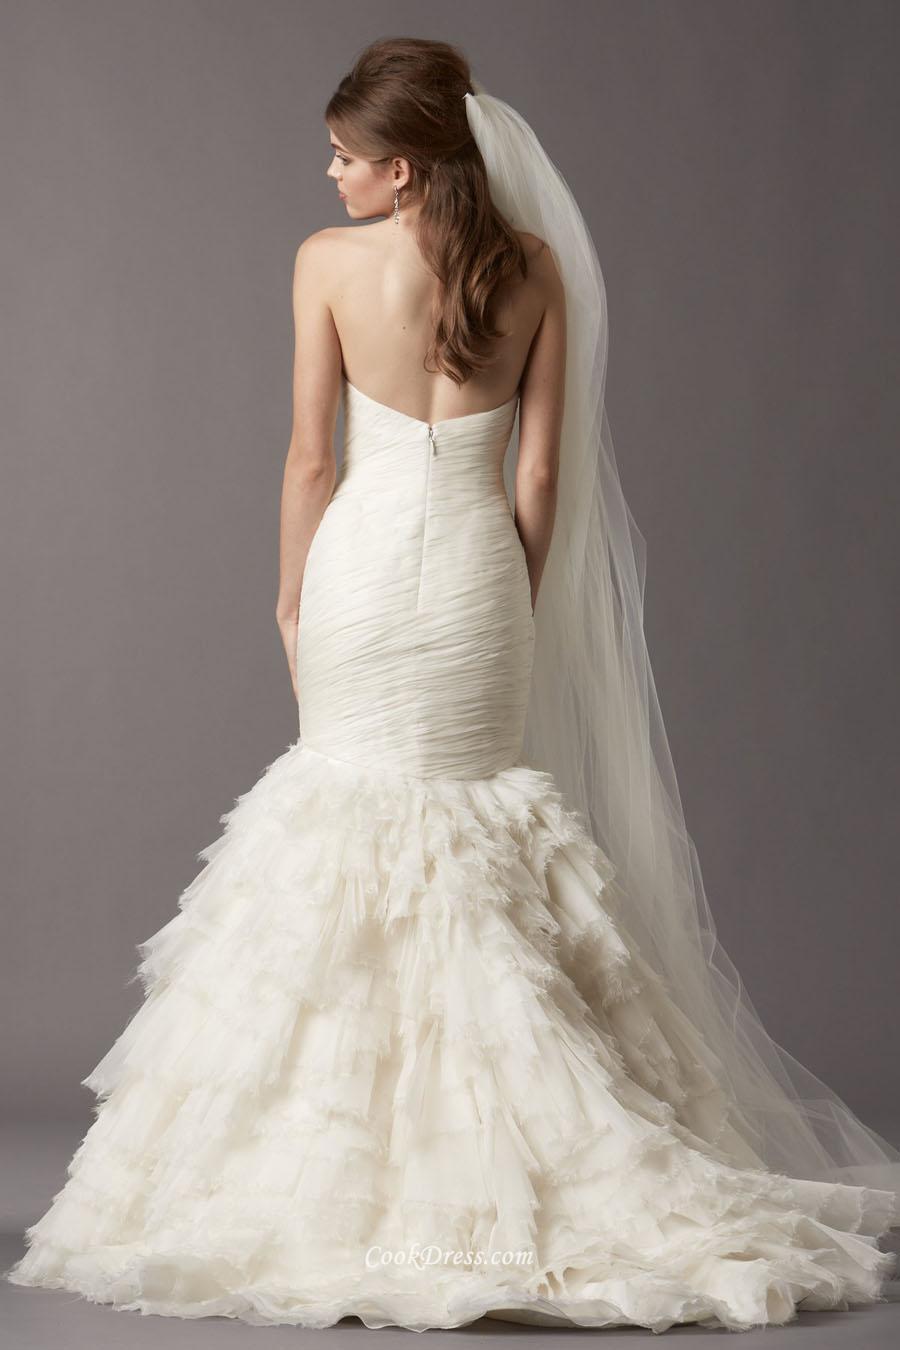 strapless white wedding dresses photo - 1